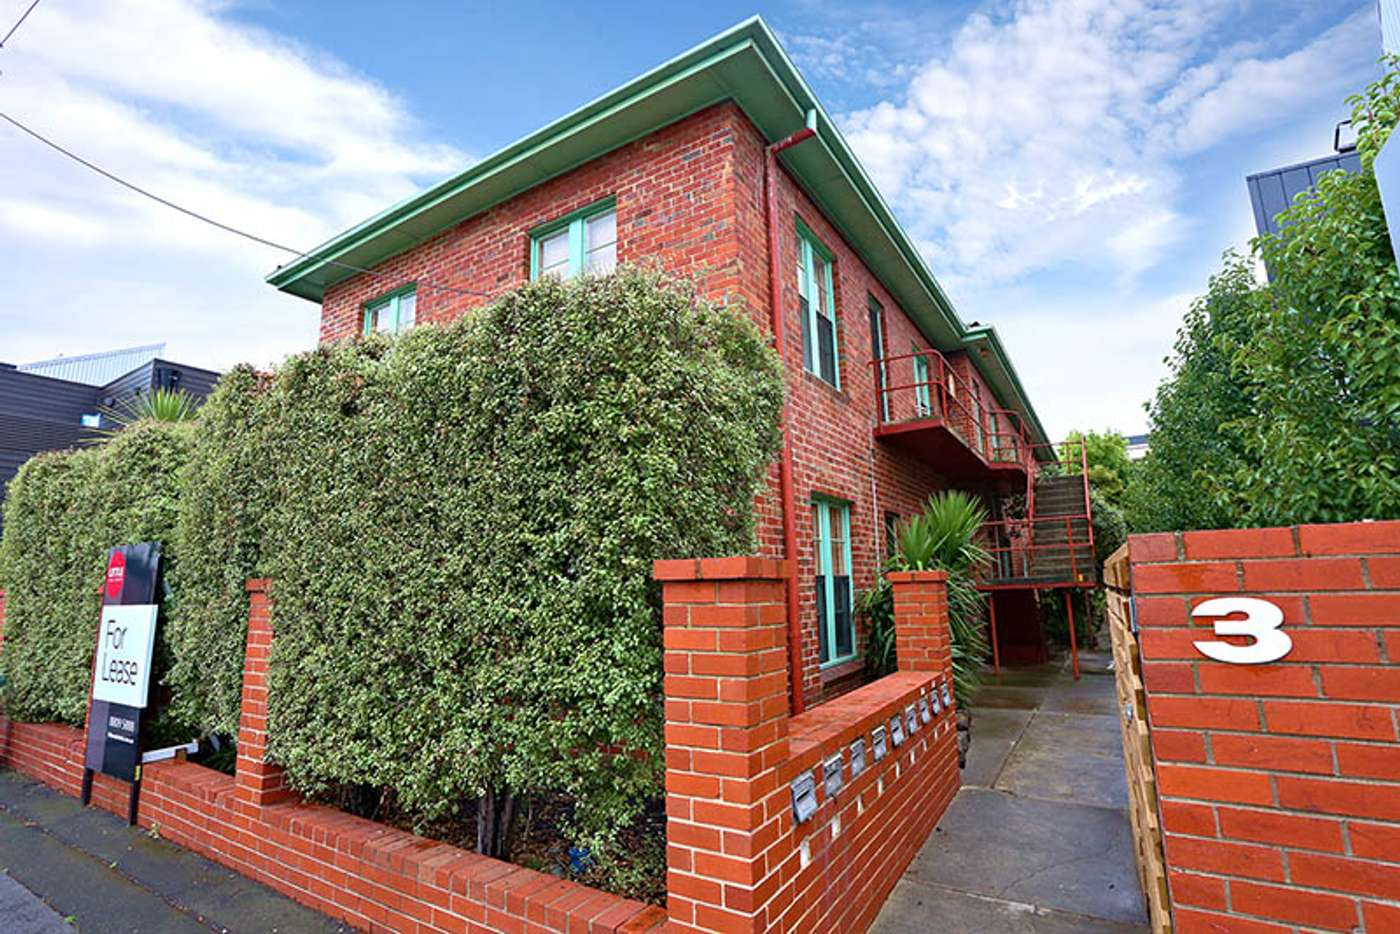 Main view of Homely apartment listing, 7/3 Stillman Street, Richmond VIC 3121